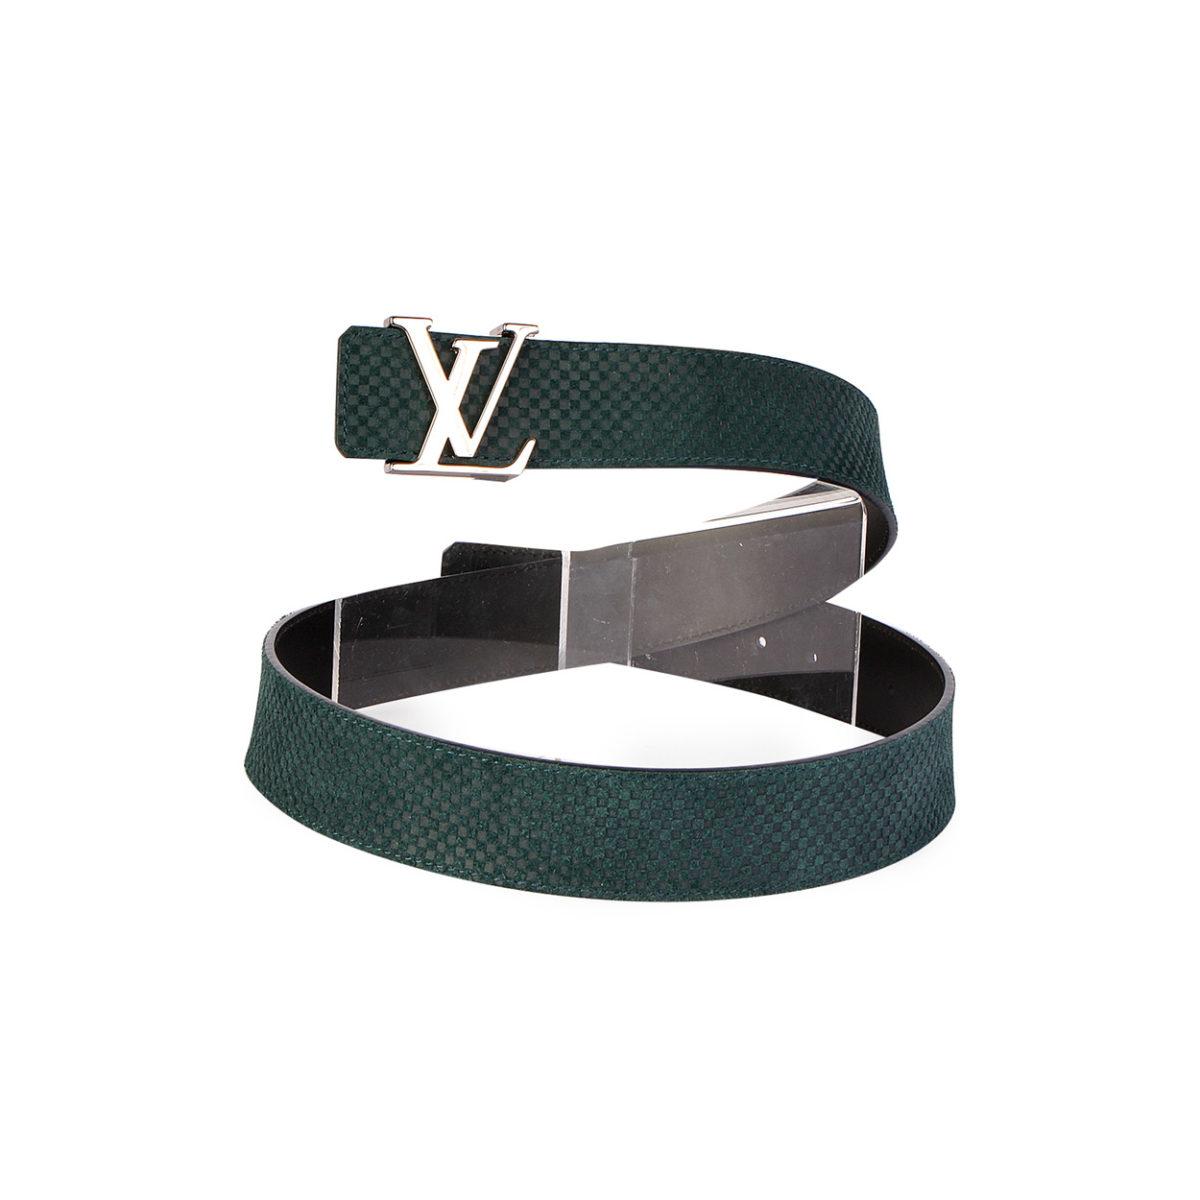 LOUIS VUITTON Mini Damier Suede Calfskin 40mm LV Initiales Belt Olive Green  - S: 110 (44)